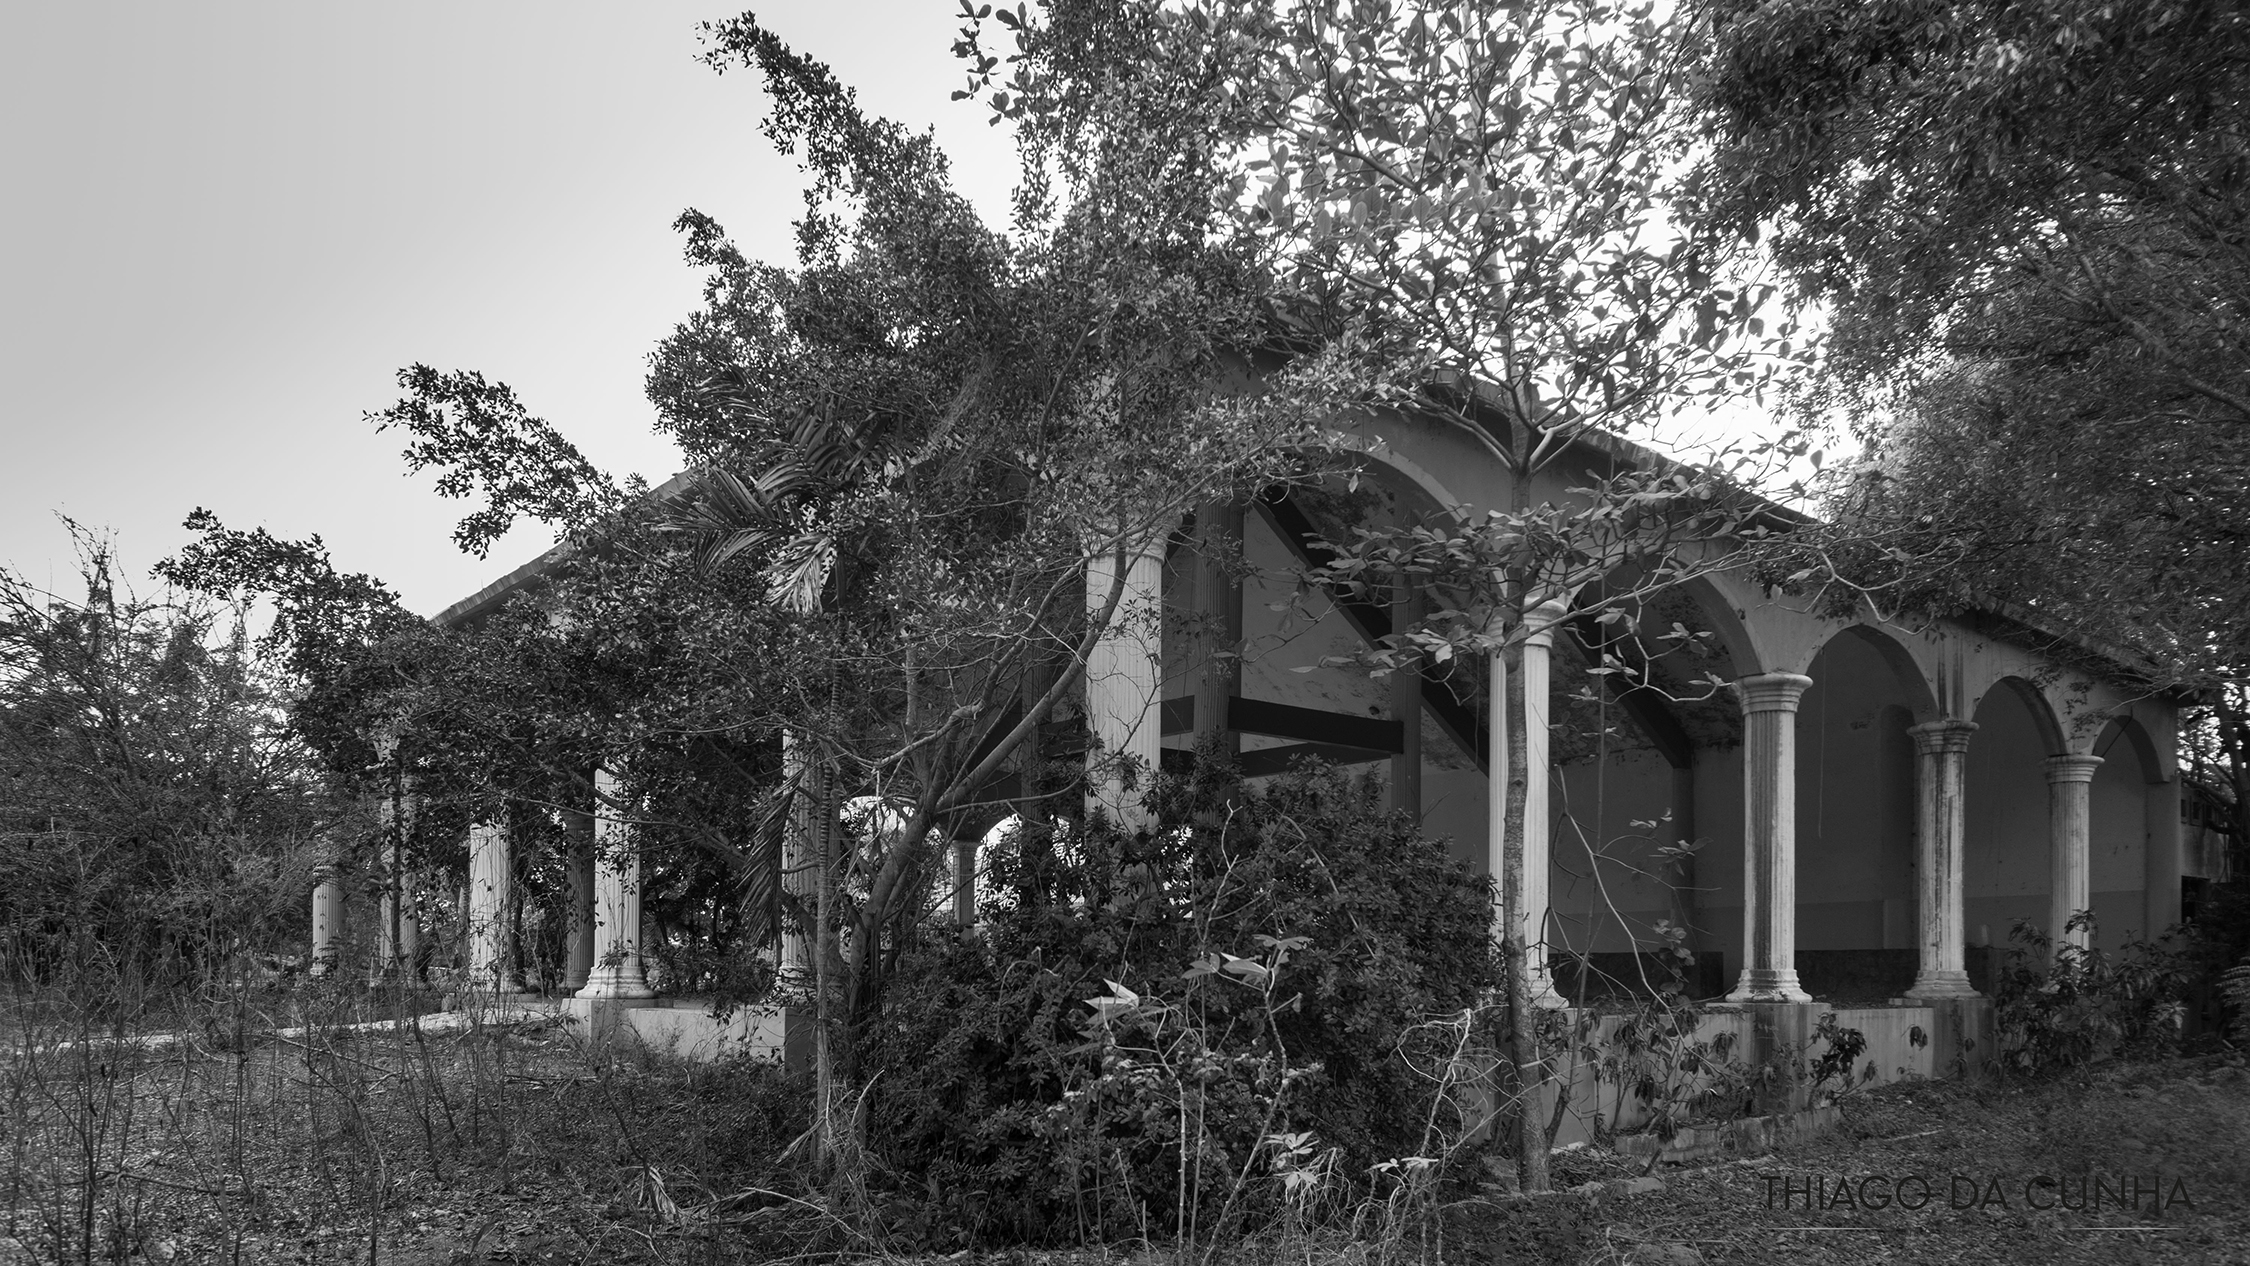 caribbean abandoned hotels and resorts.jpg